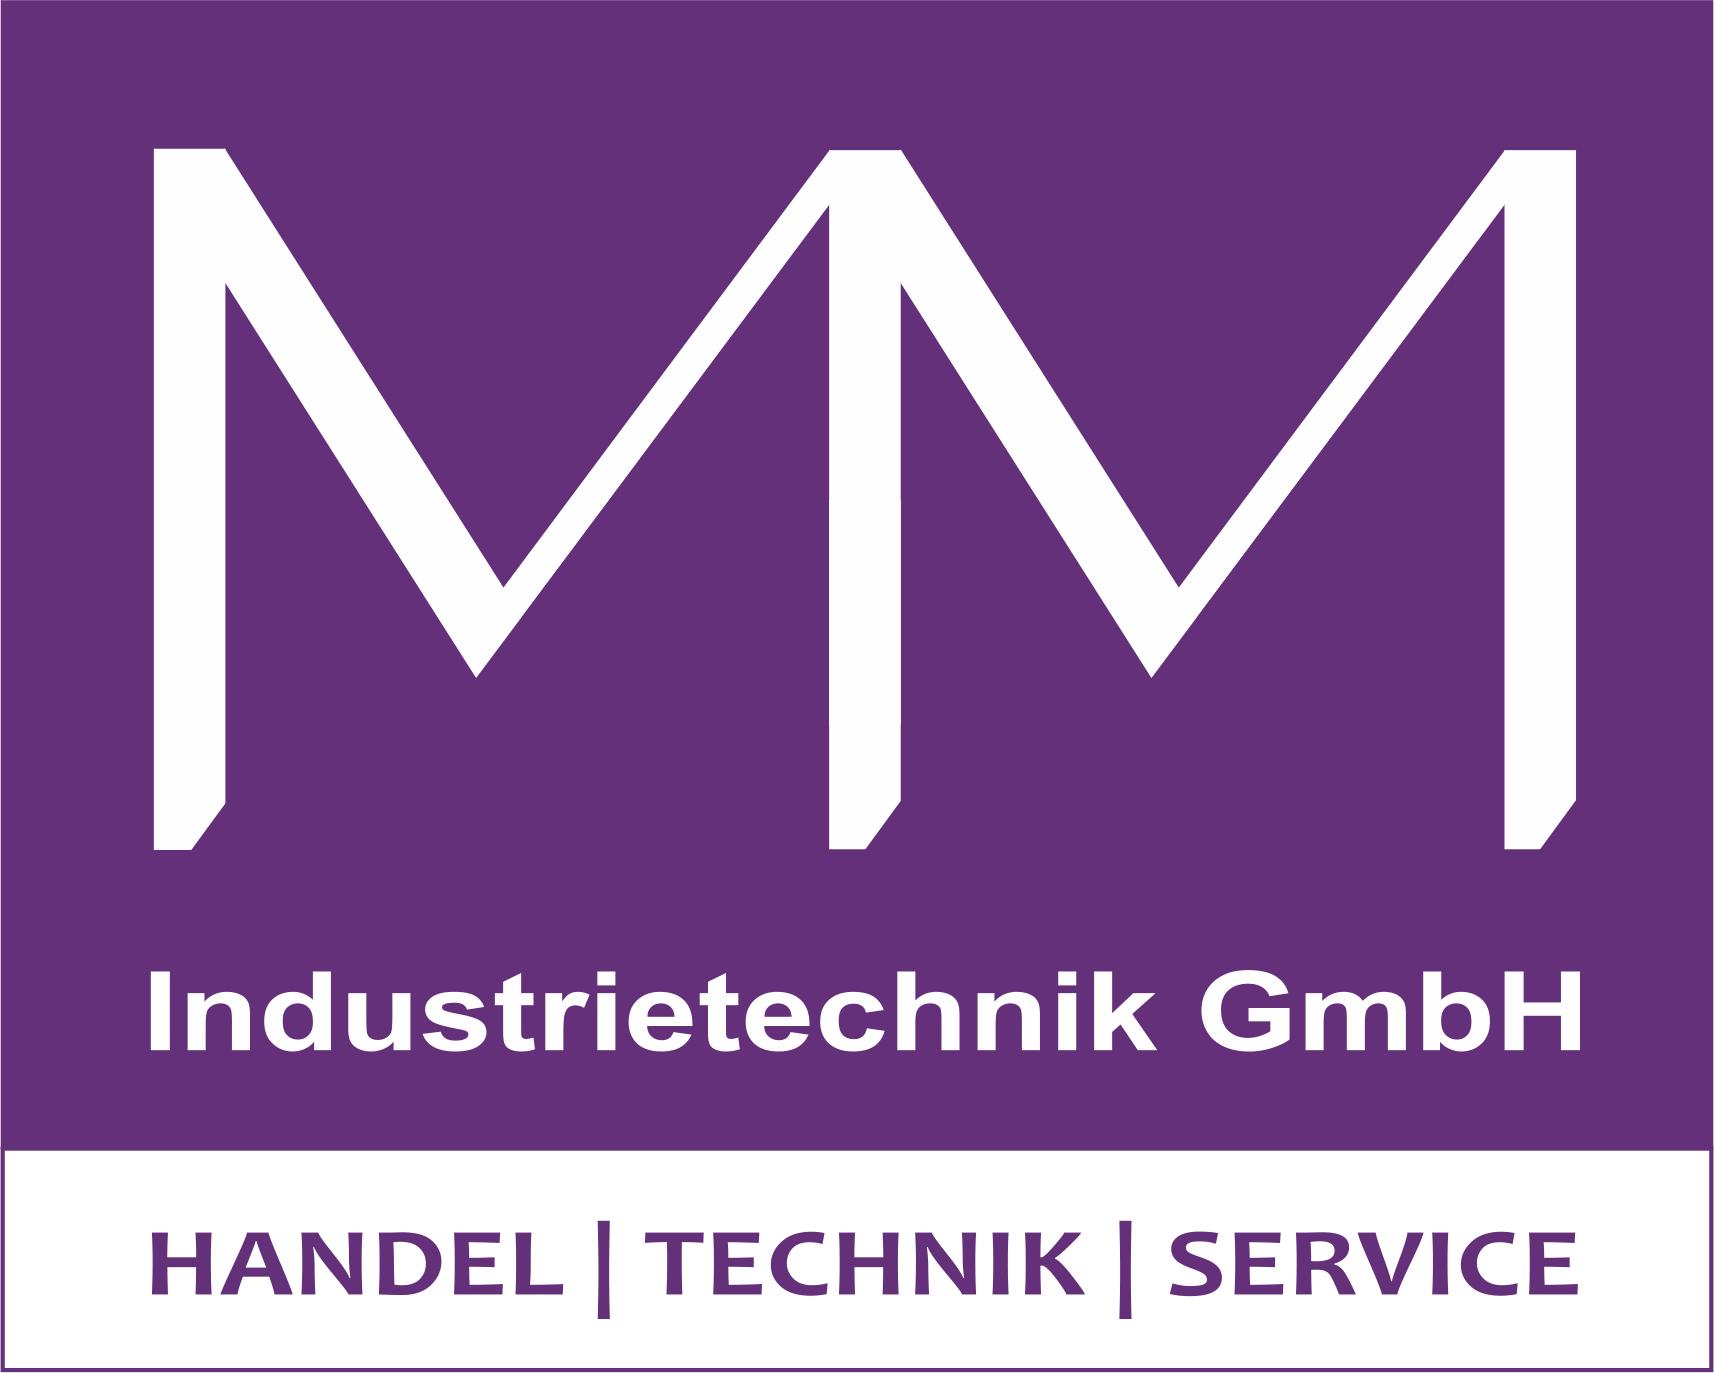 M&M Industrietechnik GmbH